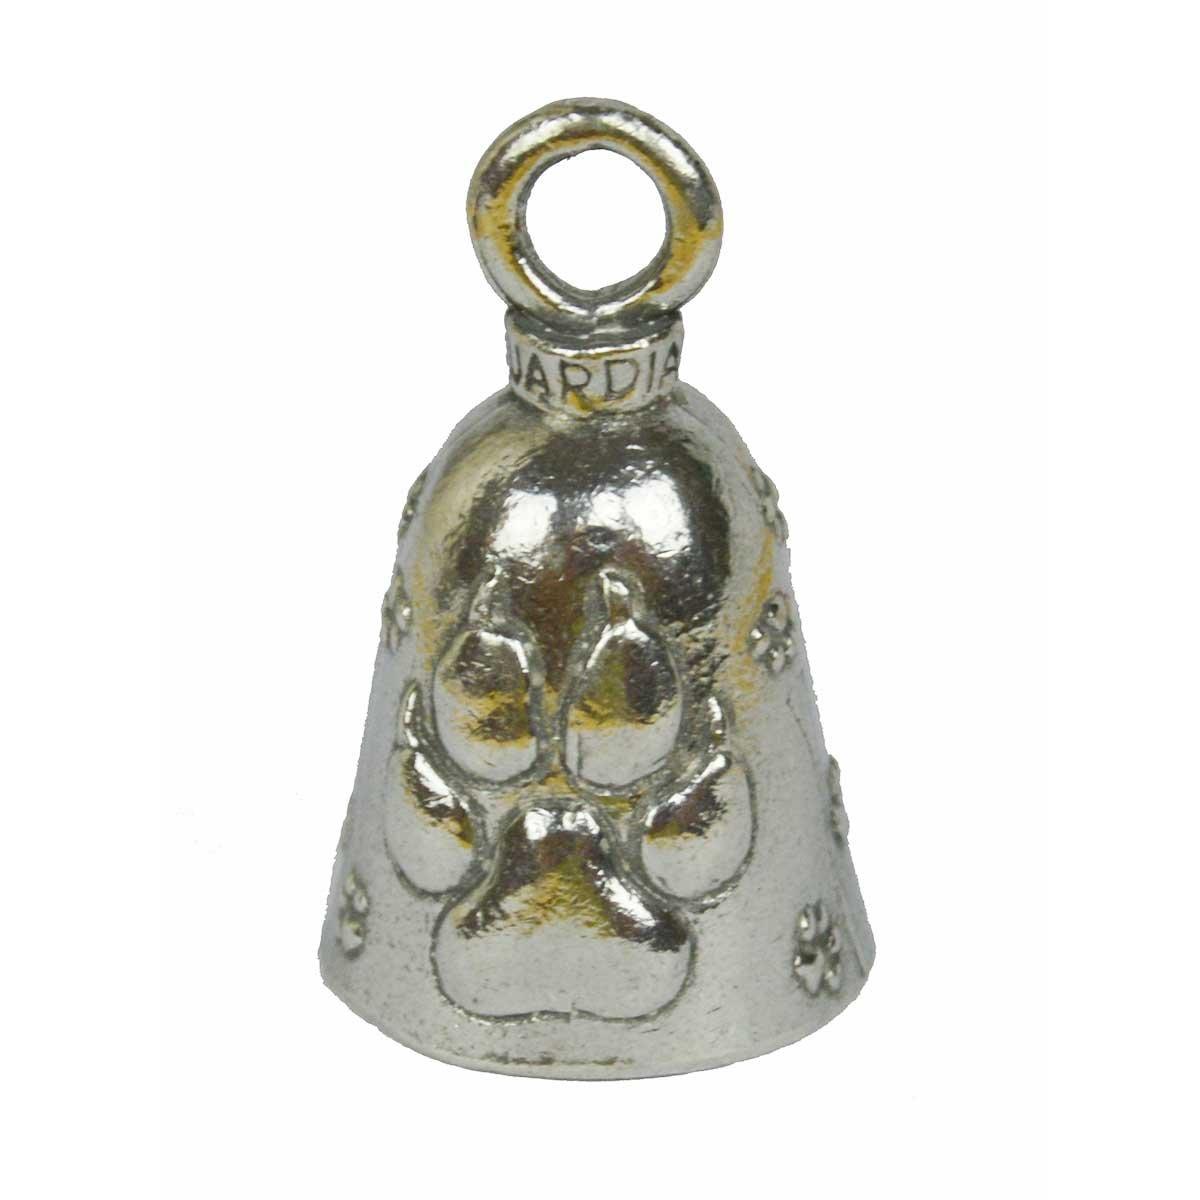 Dog Paw Guardian Bell LYSB01M0CLHRJ-SPRTSEQIP